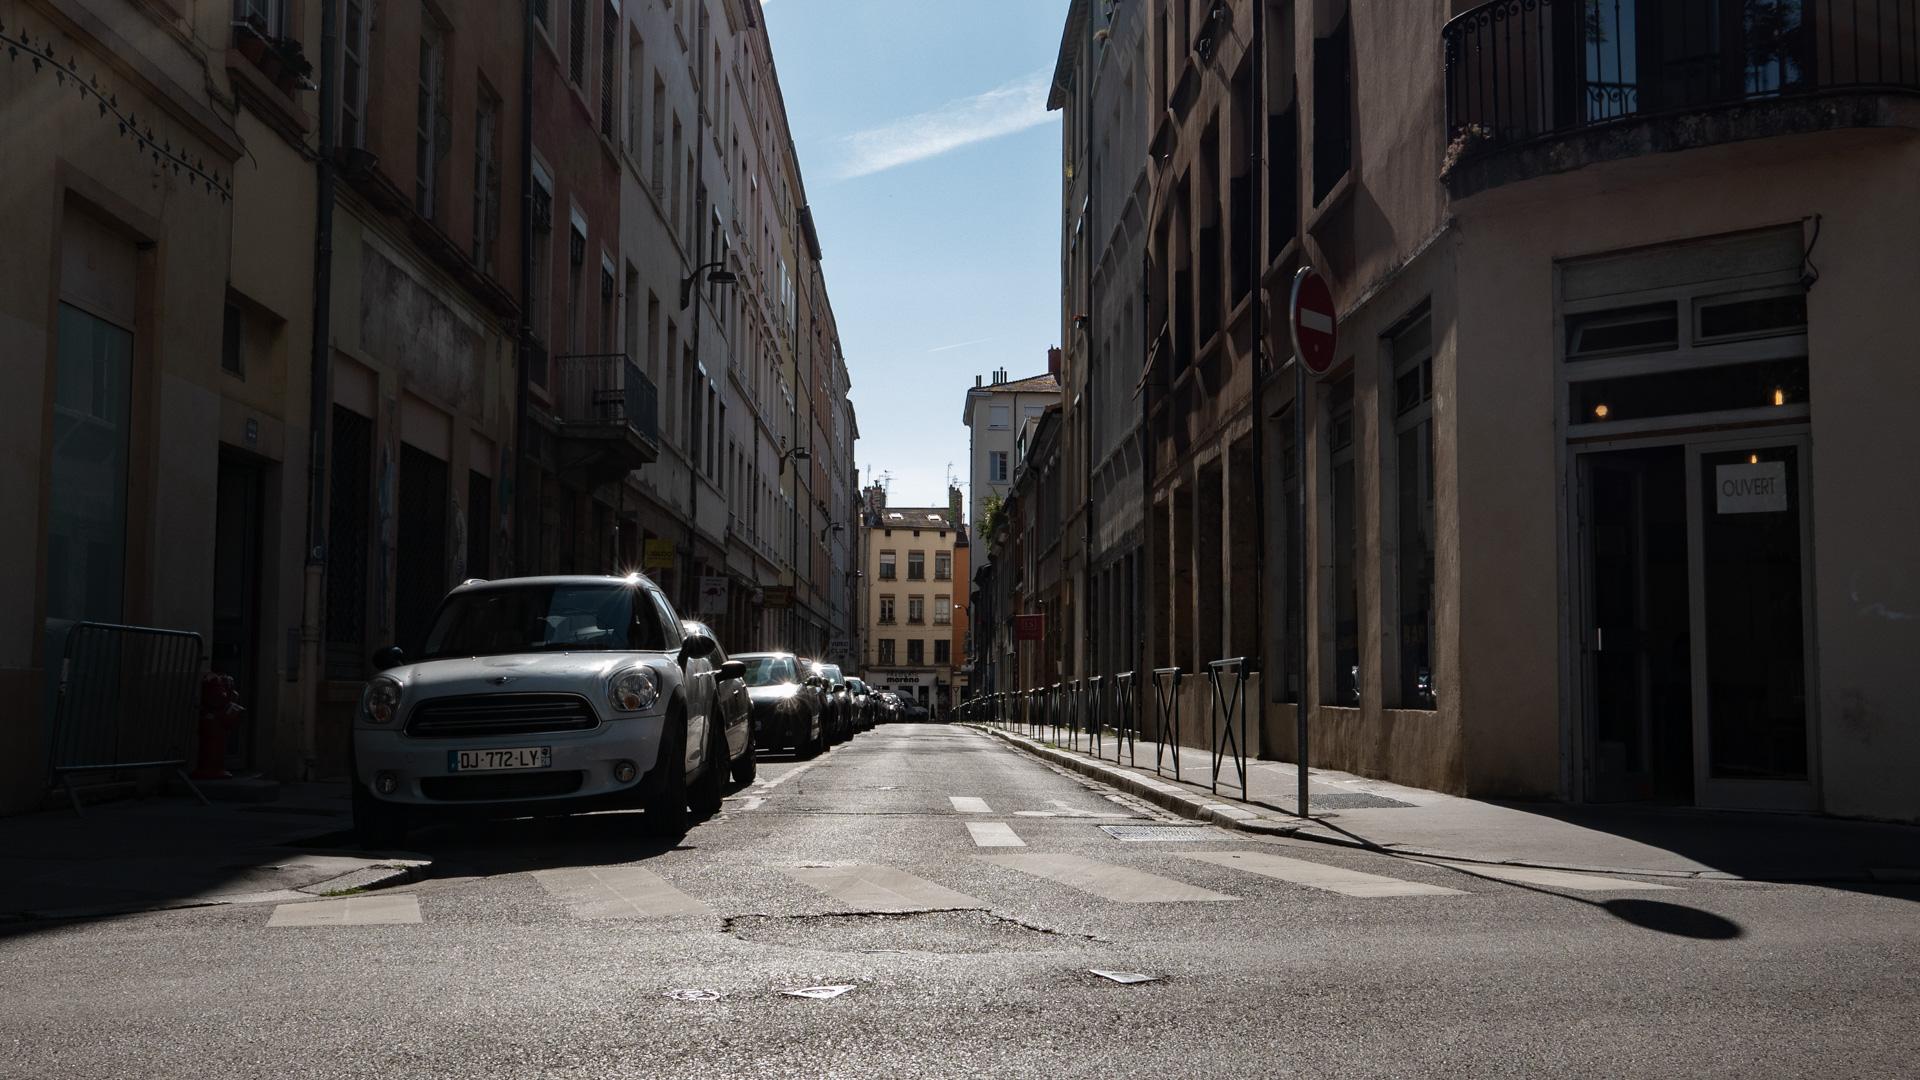 lyon-street-croix-rousse.jpg